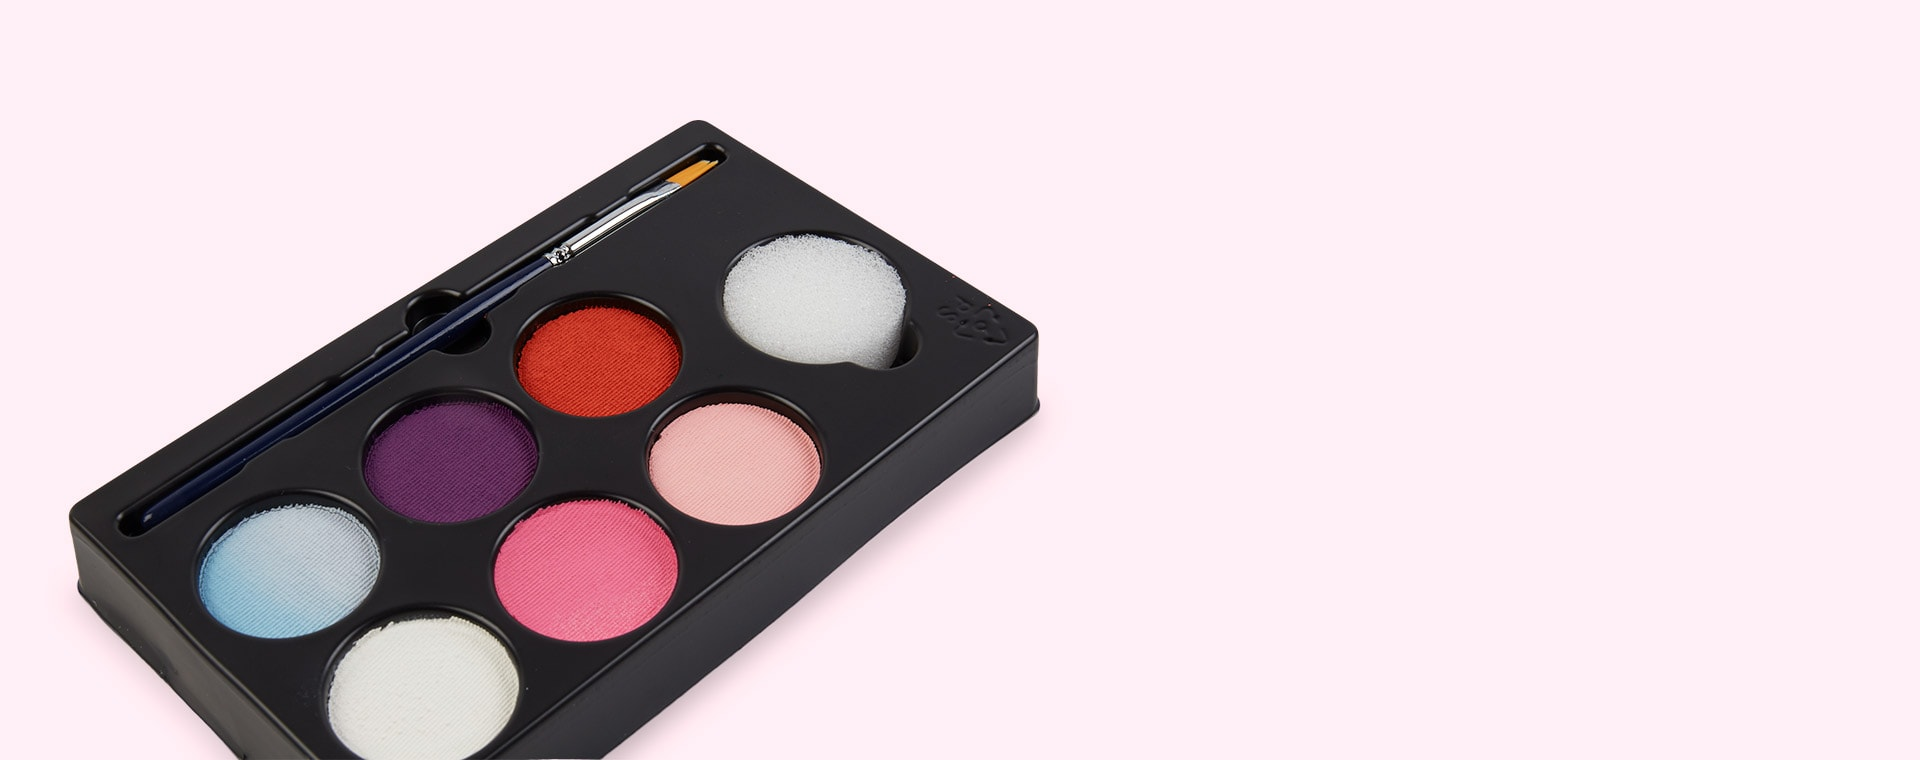 Sweet Djeco Face Paint Set